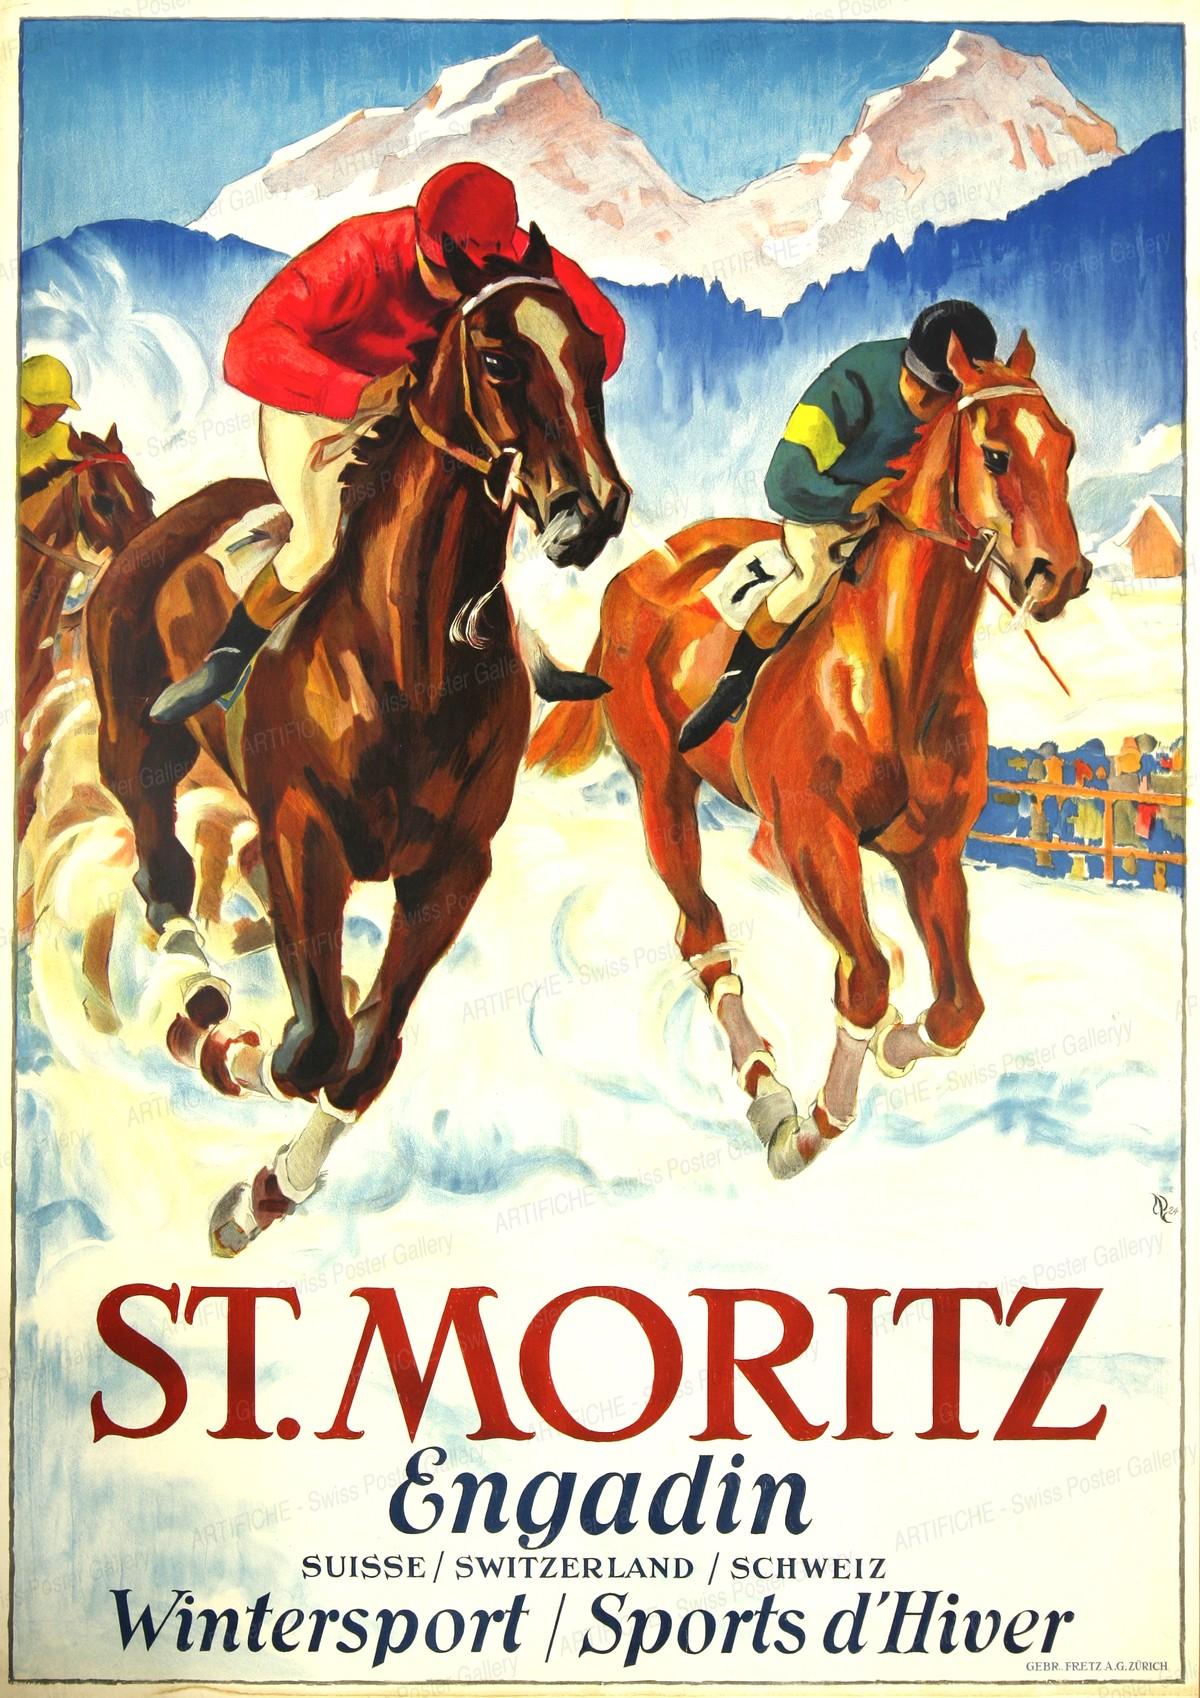 ST. MORITZ – ENGADINE Switzerland, Hugo Laubi